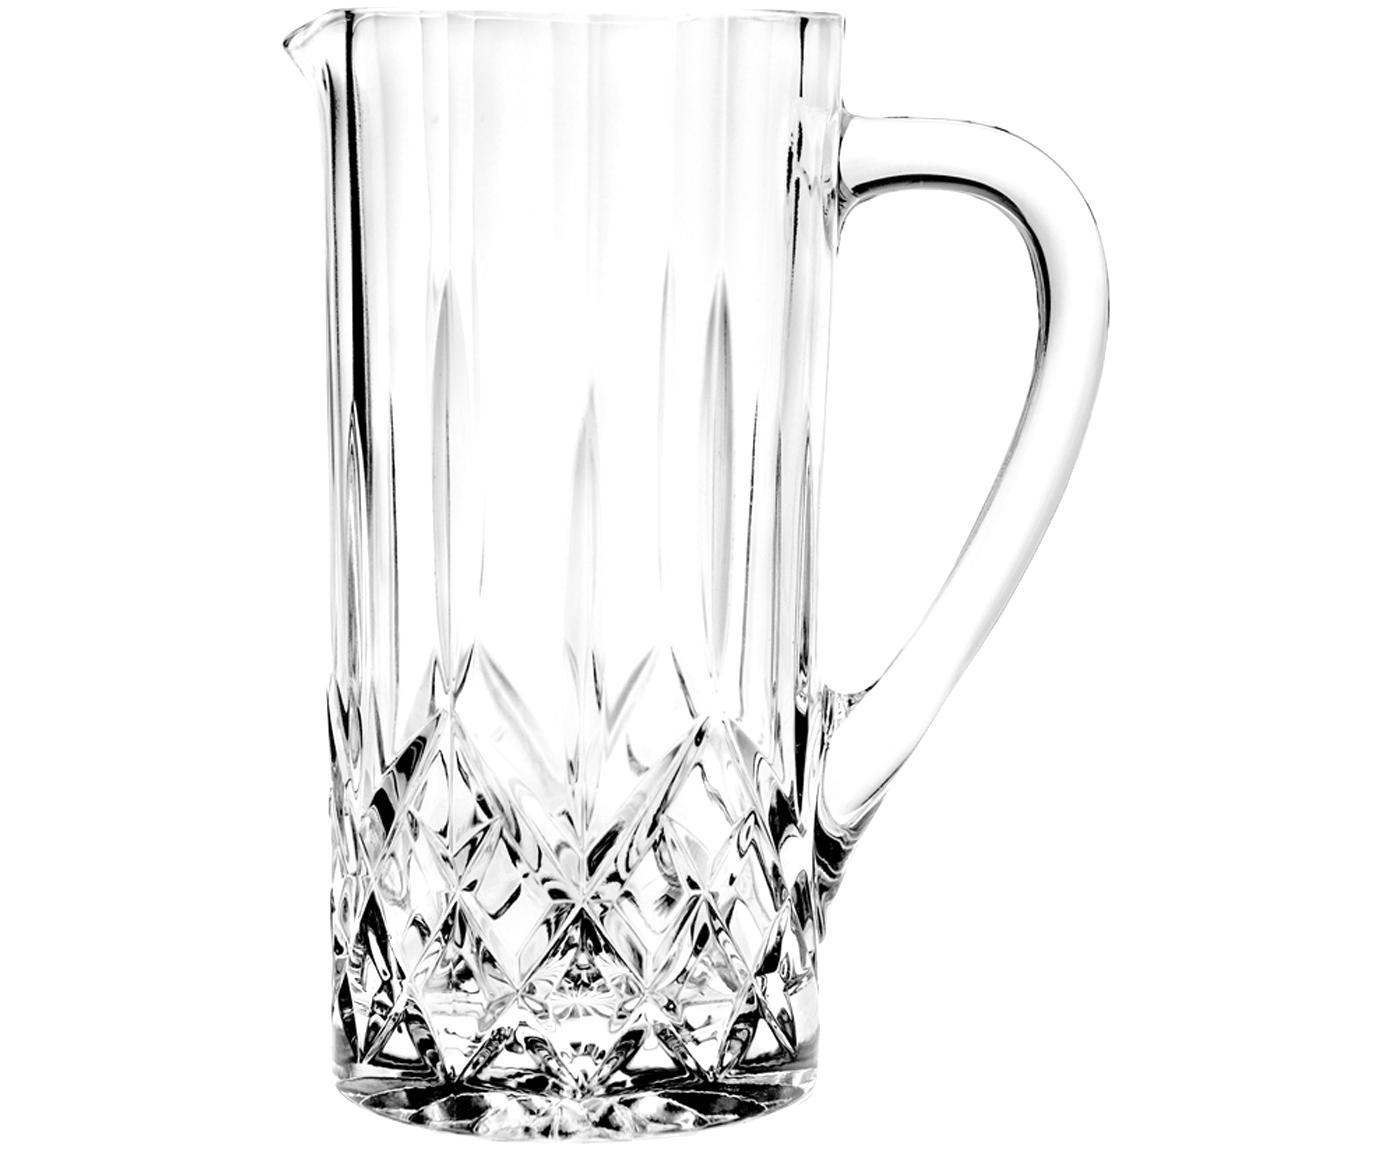 Kristall-Krug Opera, Luxion-Kristallglas, Transparent, 1.2 L